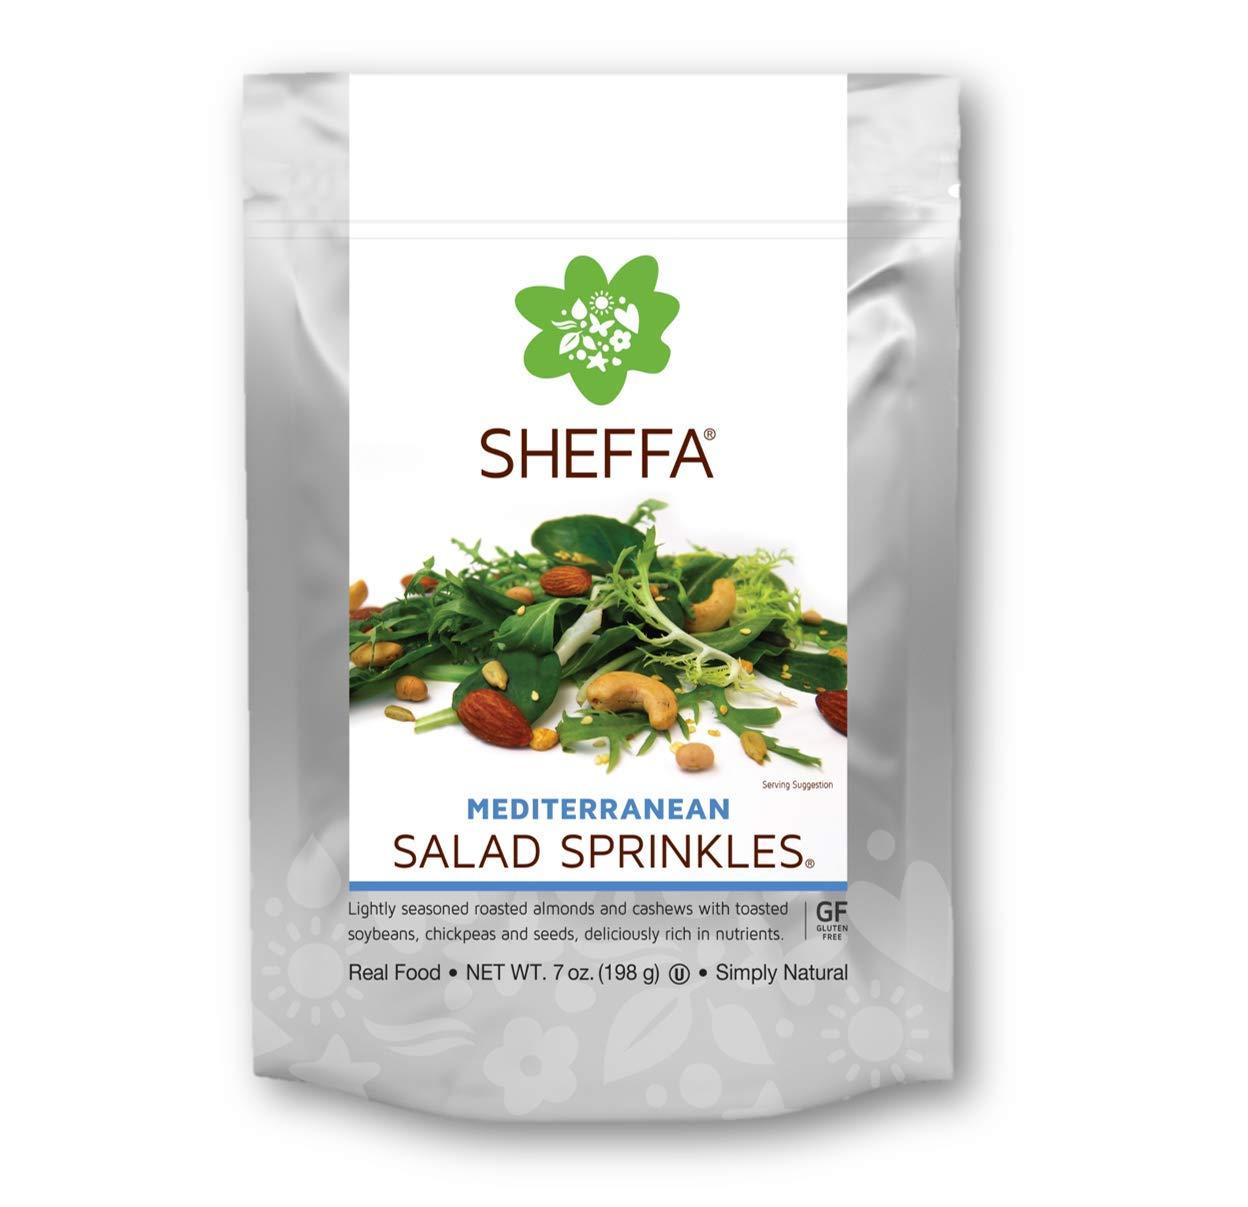 Sheffa Gourmet Mediterranean Trail and Salad Mix (7oz 3 Pack) - Gluten Free, Vegan